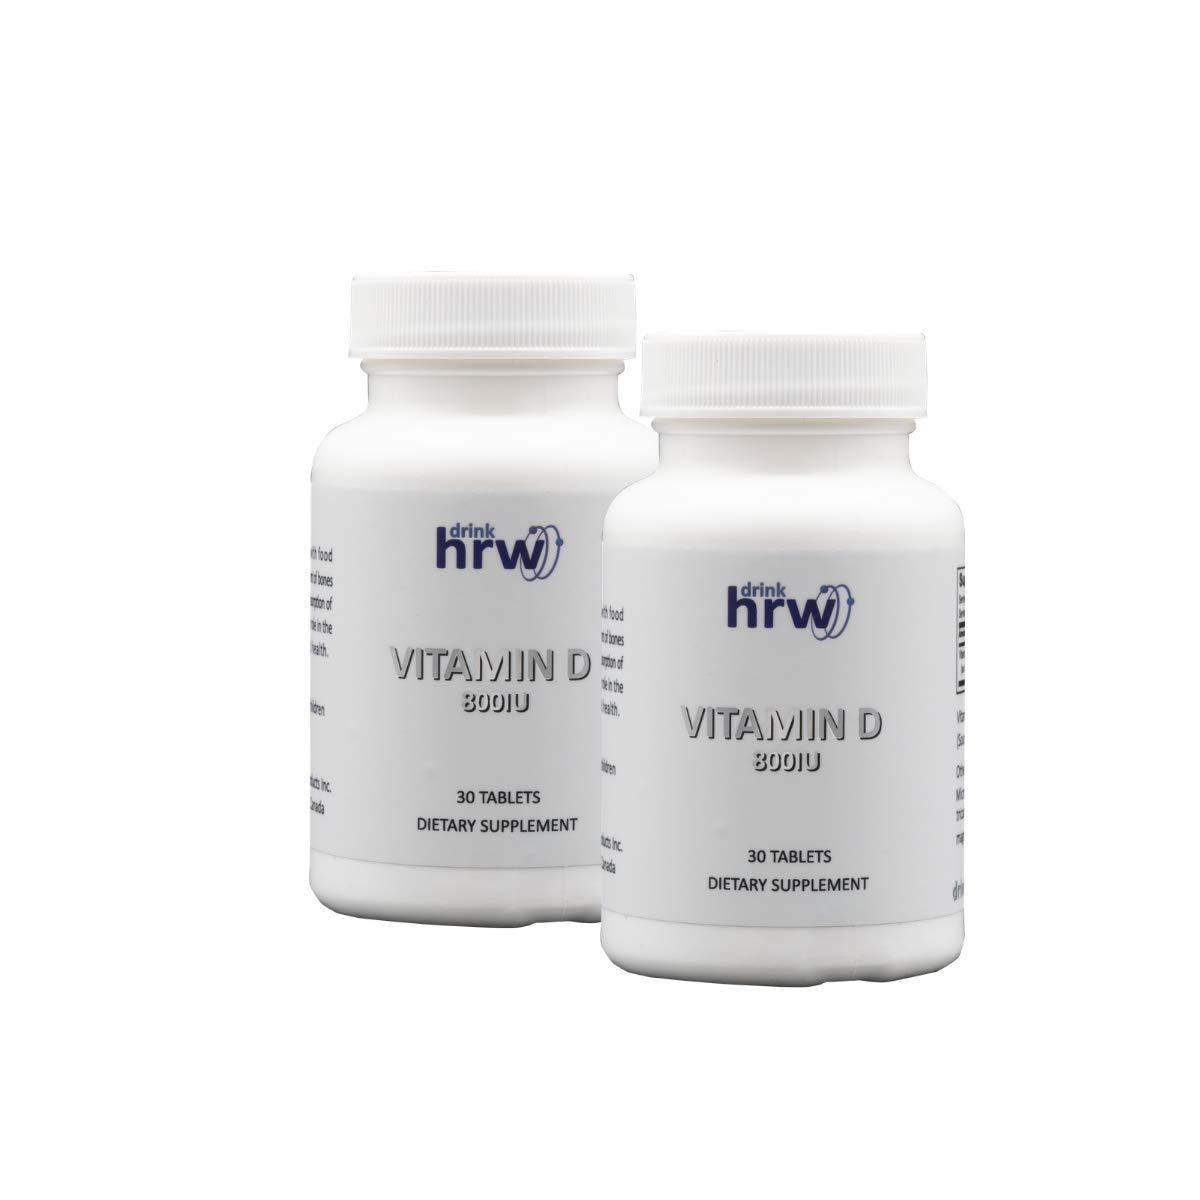 Drink HRW 800IU Vitamin D Supplement, 2 Bottles, 60 Tablets